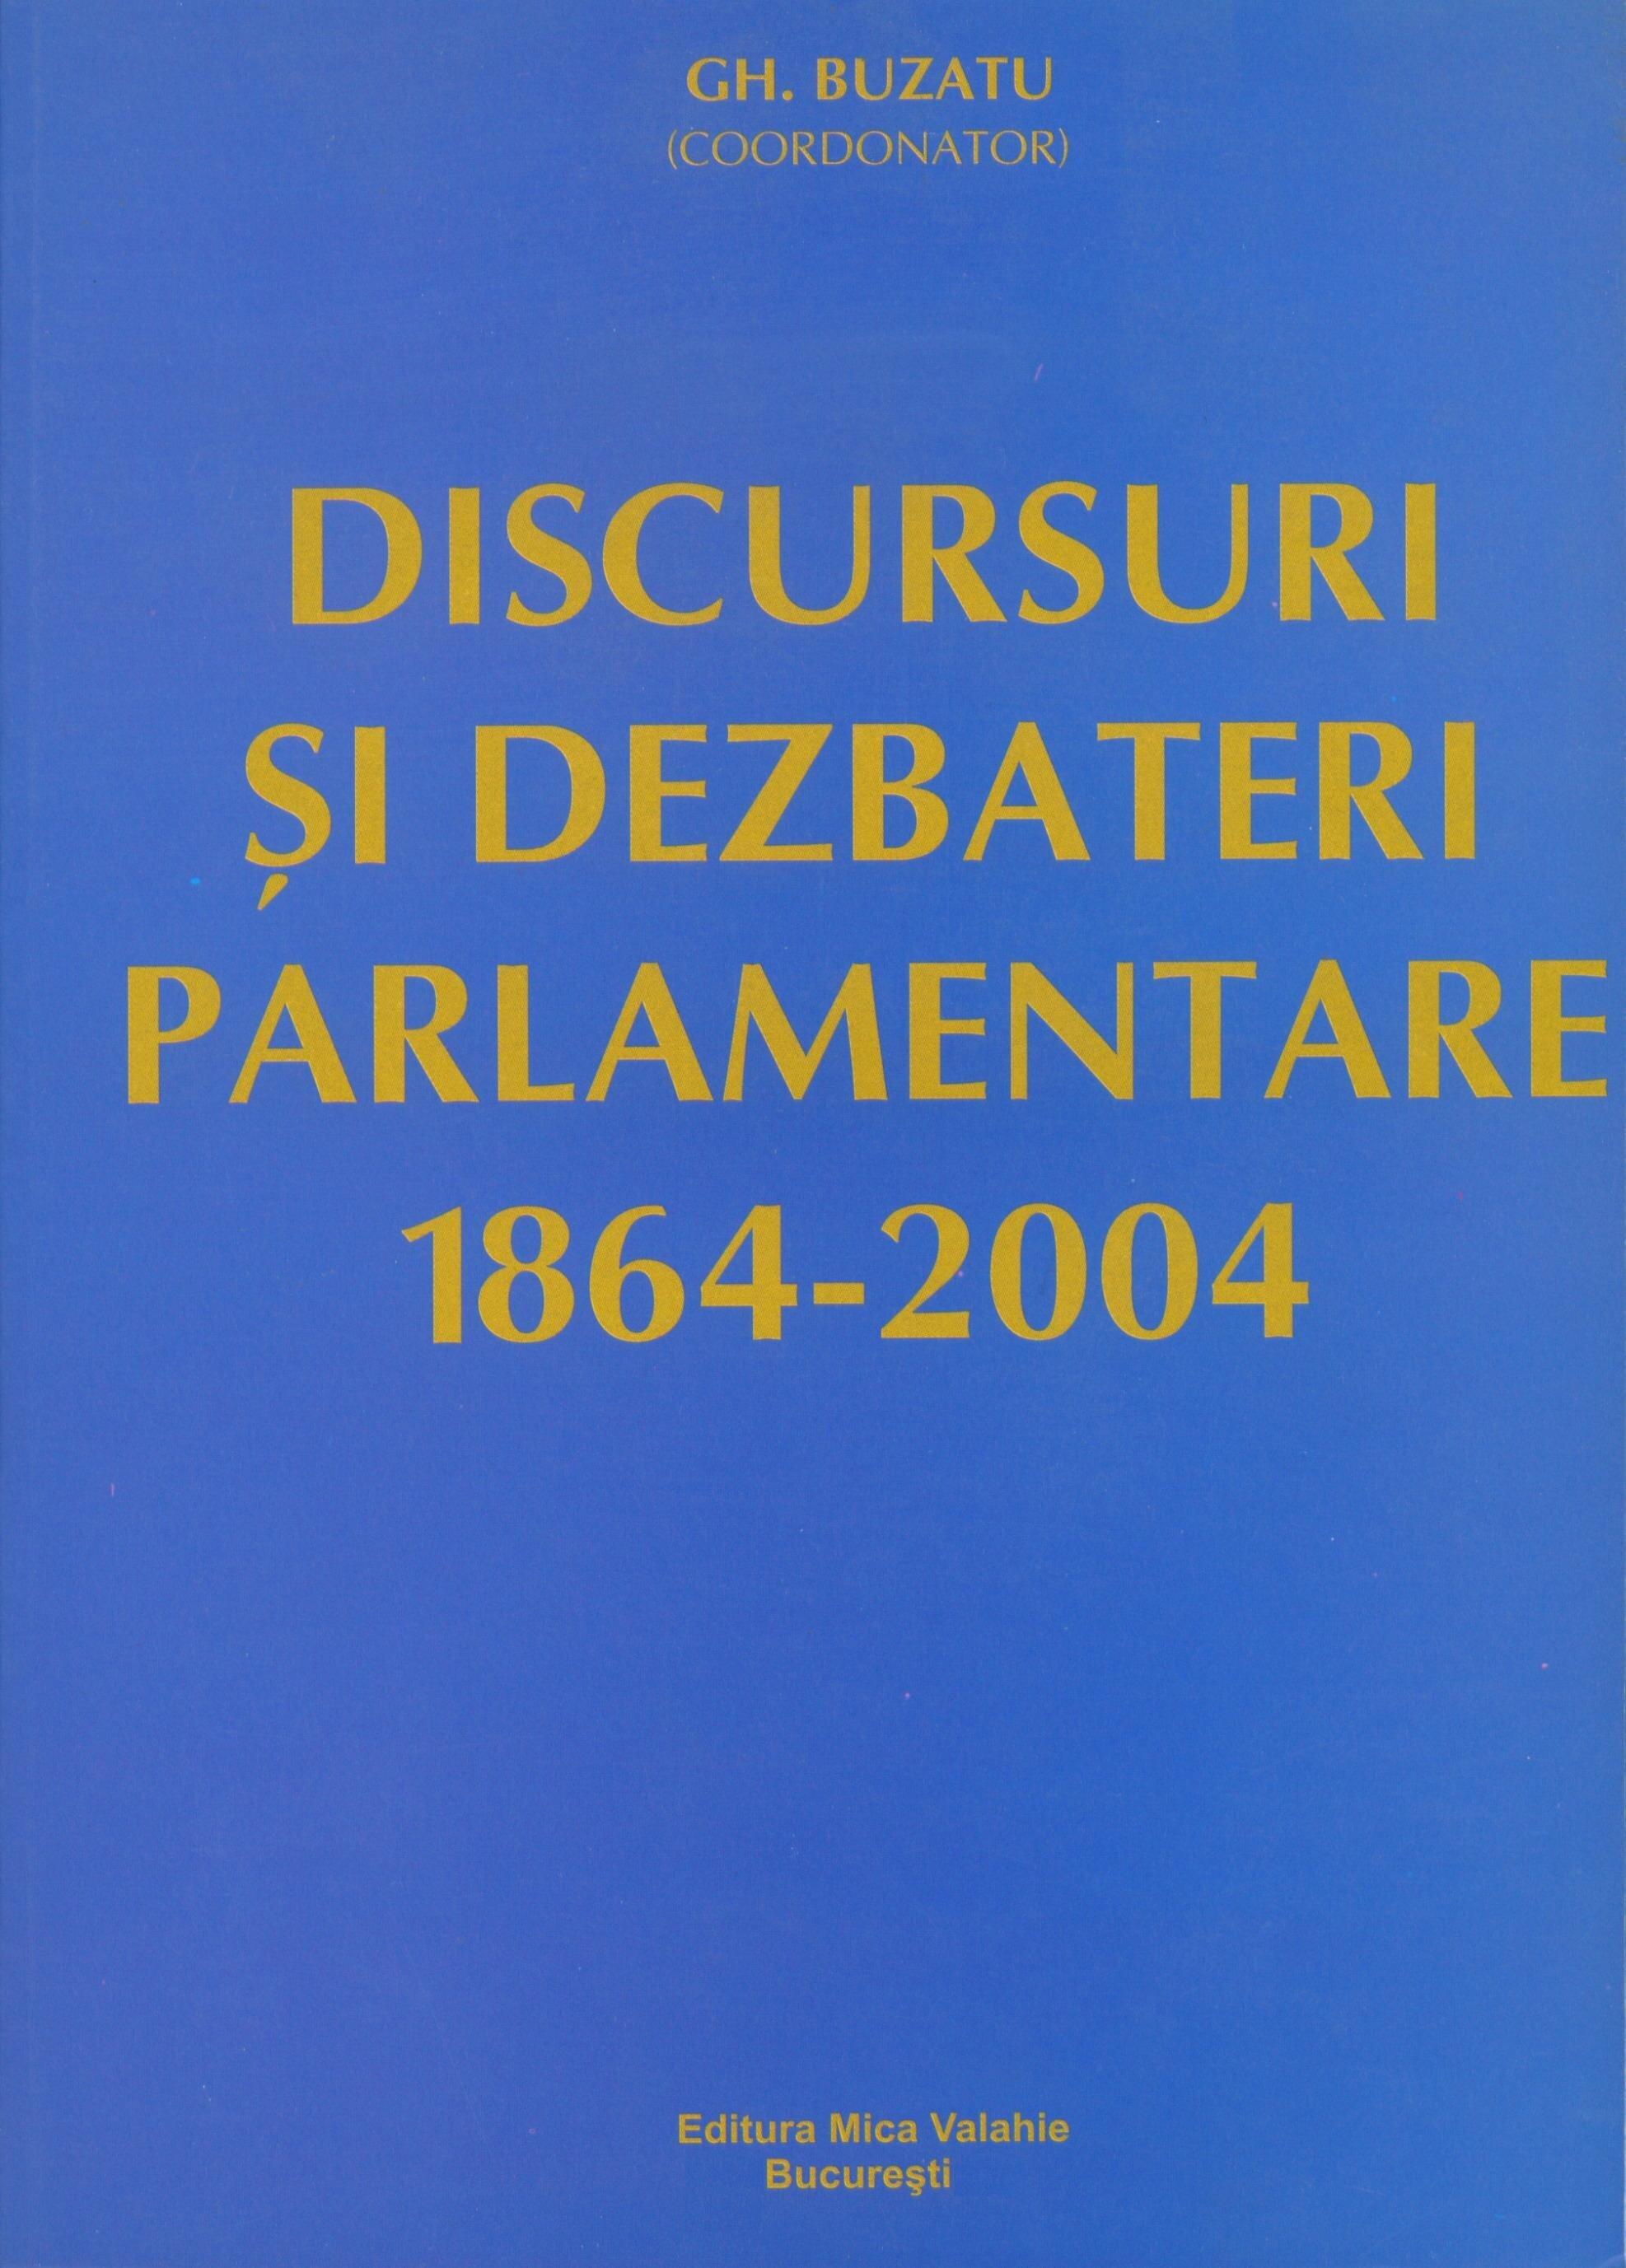 Discursuri si dezbateri parlamentare (1864-2004) (eBook)